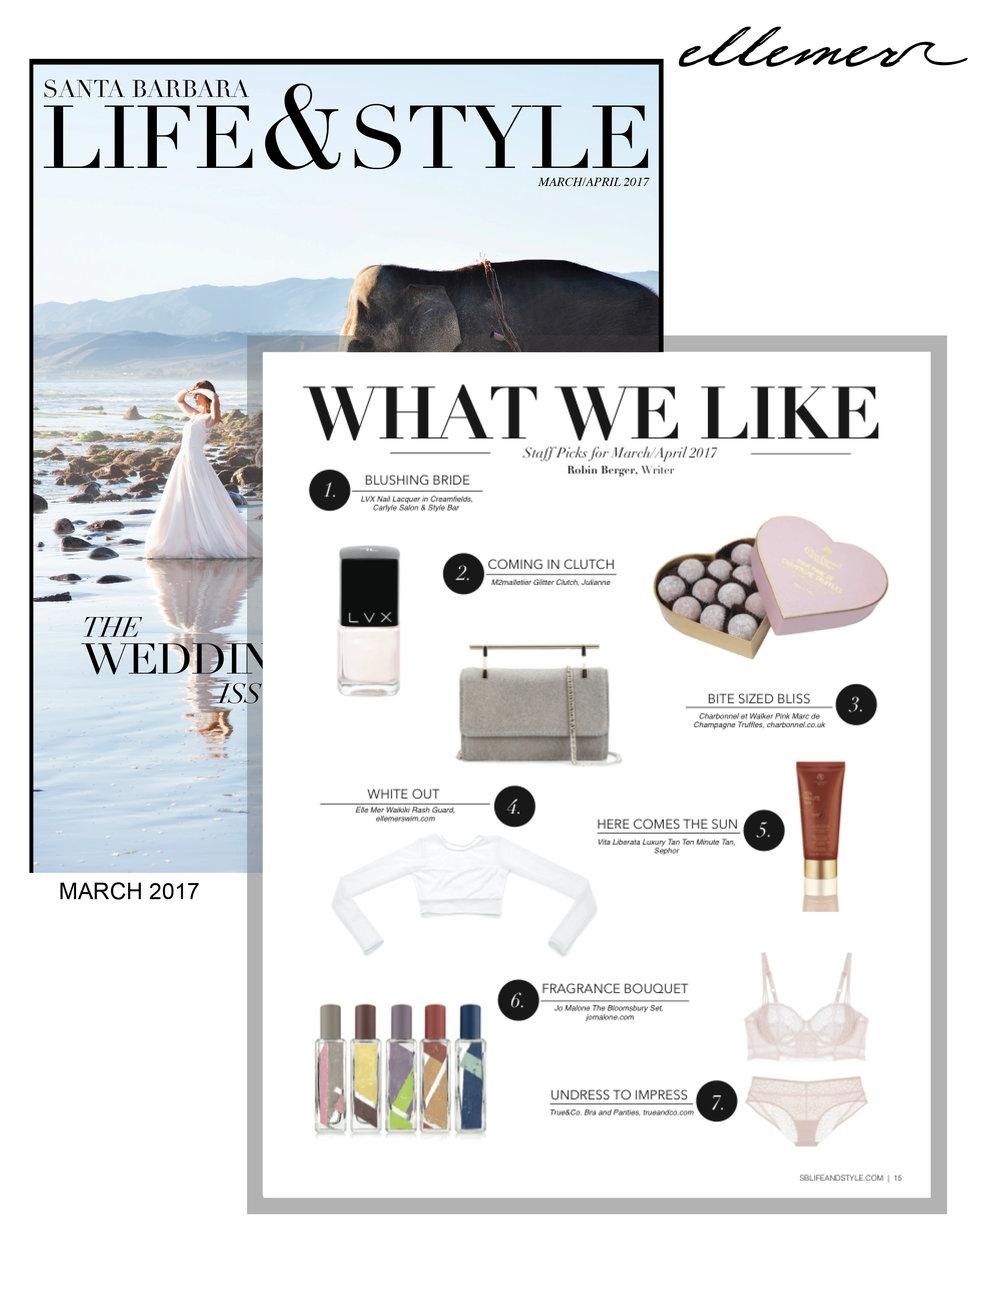 ElleMer_SantaBarbaraLife&Style_March2017.jpg